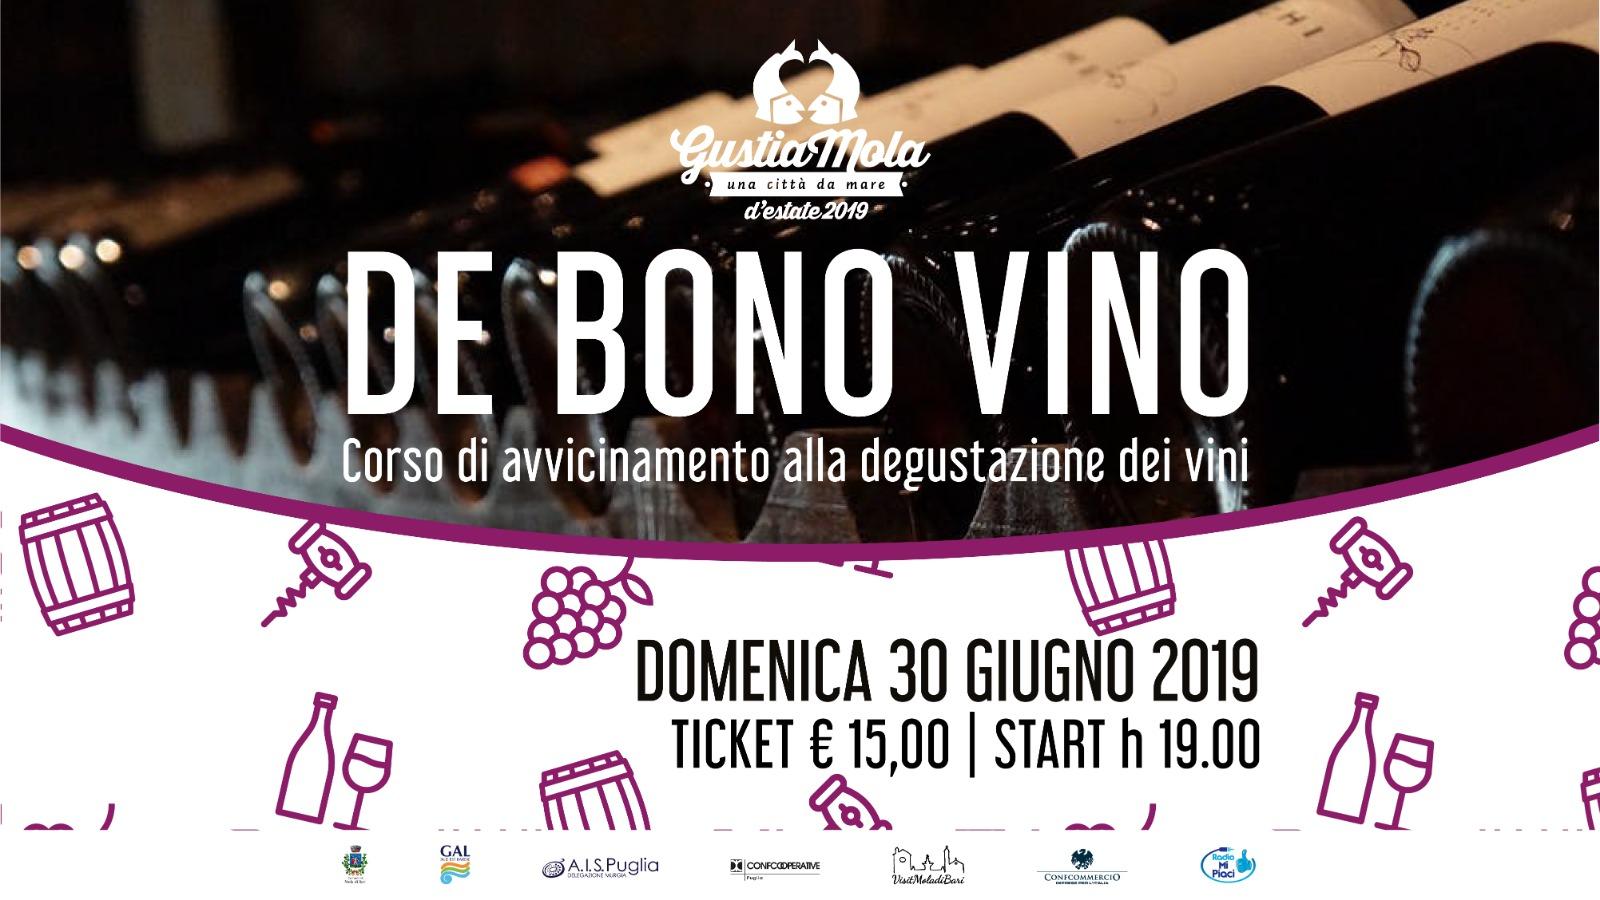 De bono vino GustiaMola 2019 Visit Mola di Bari Puglia